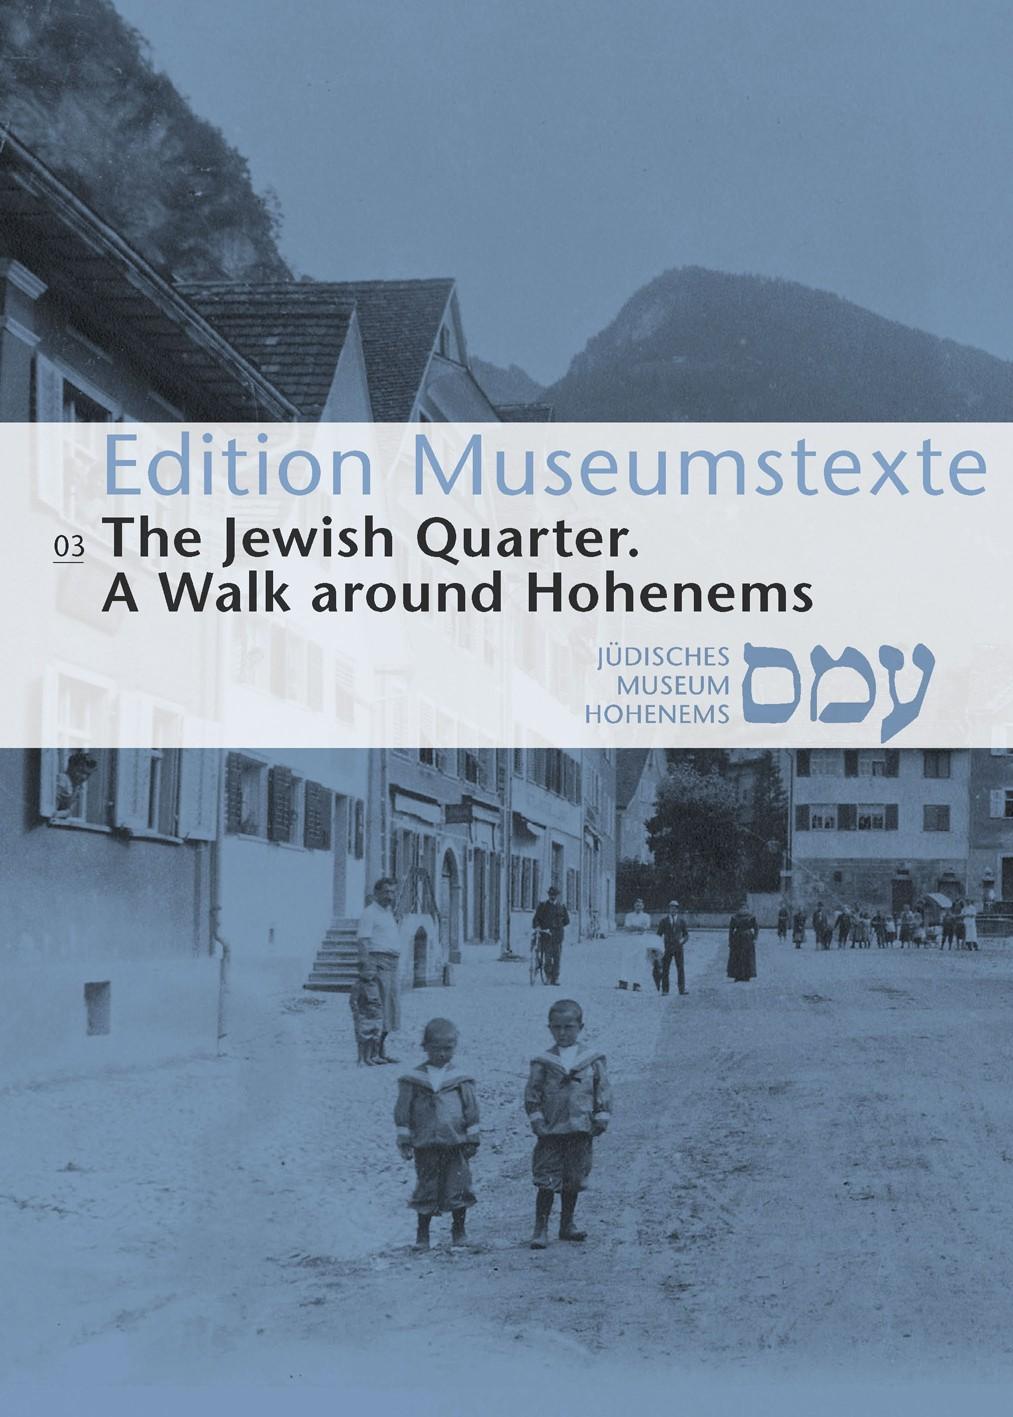 Edition Museumstexte 03  The Jewish Quarter | Jüdisches